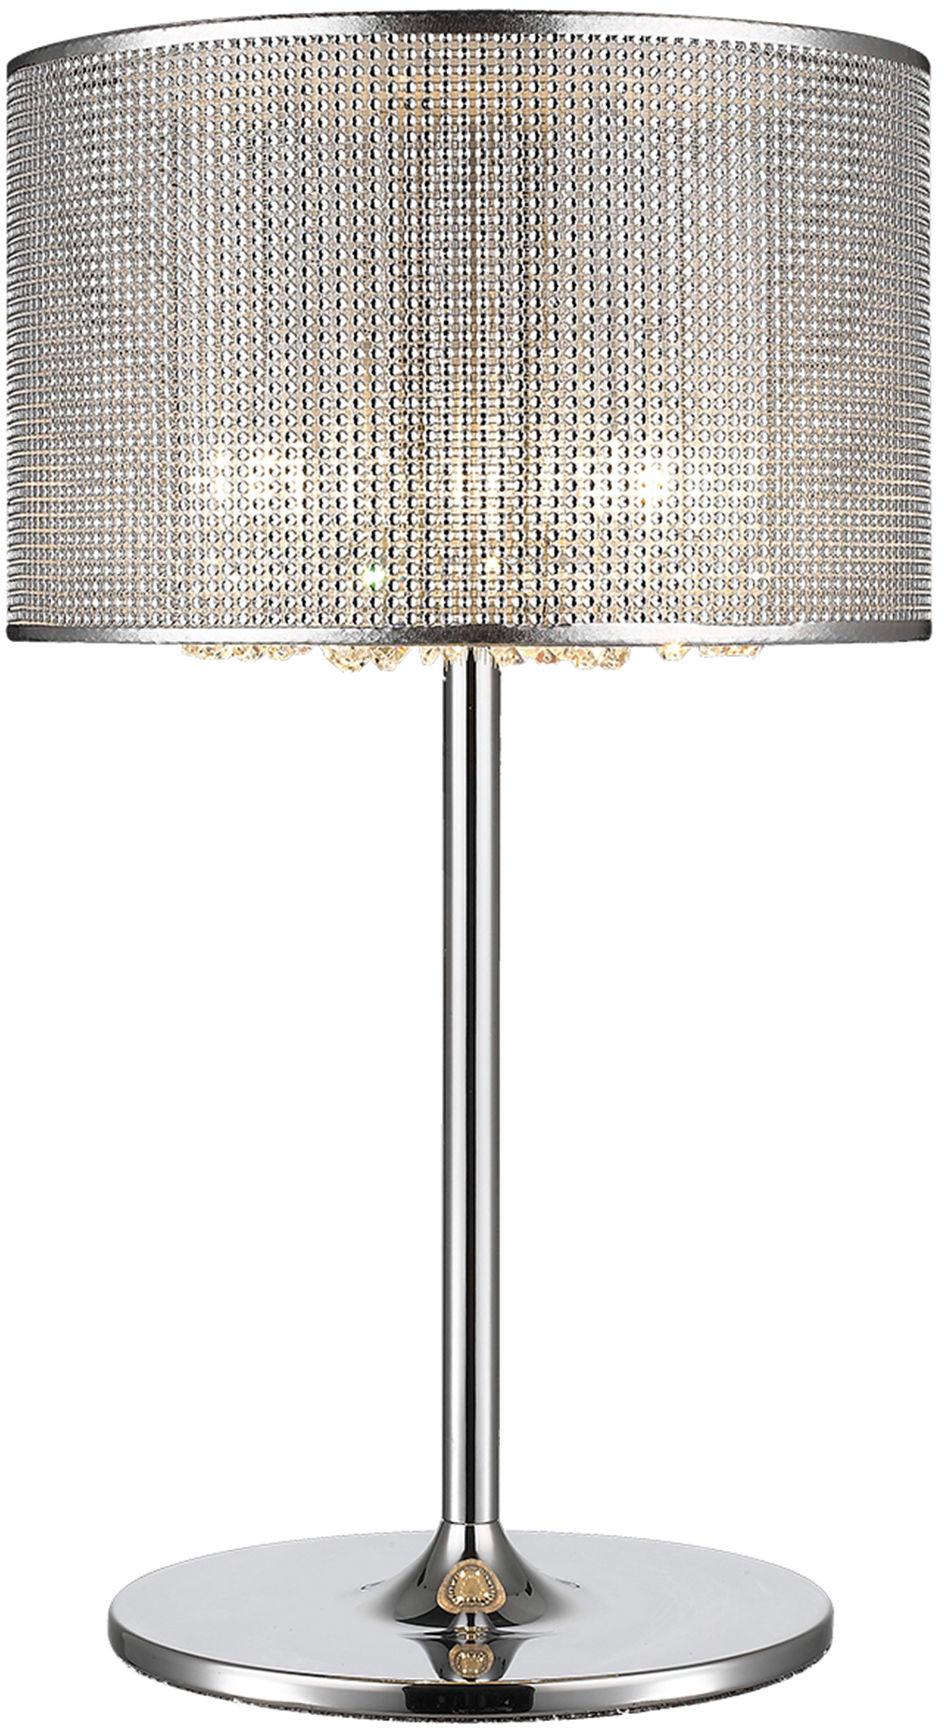 T0173-04W BLINK LAMPA STOŁOWA